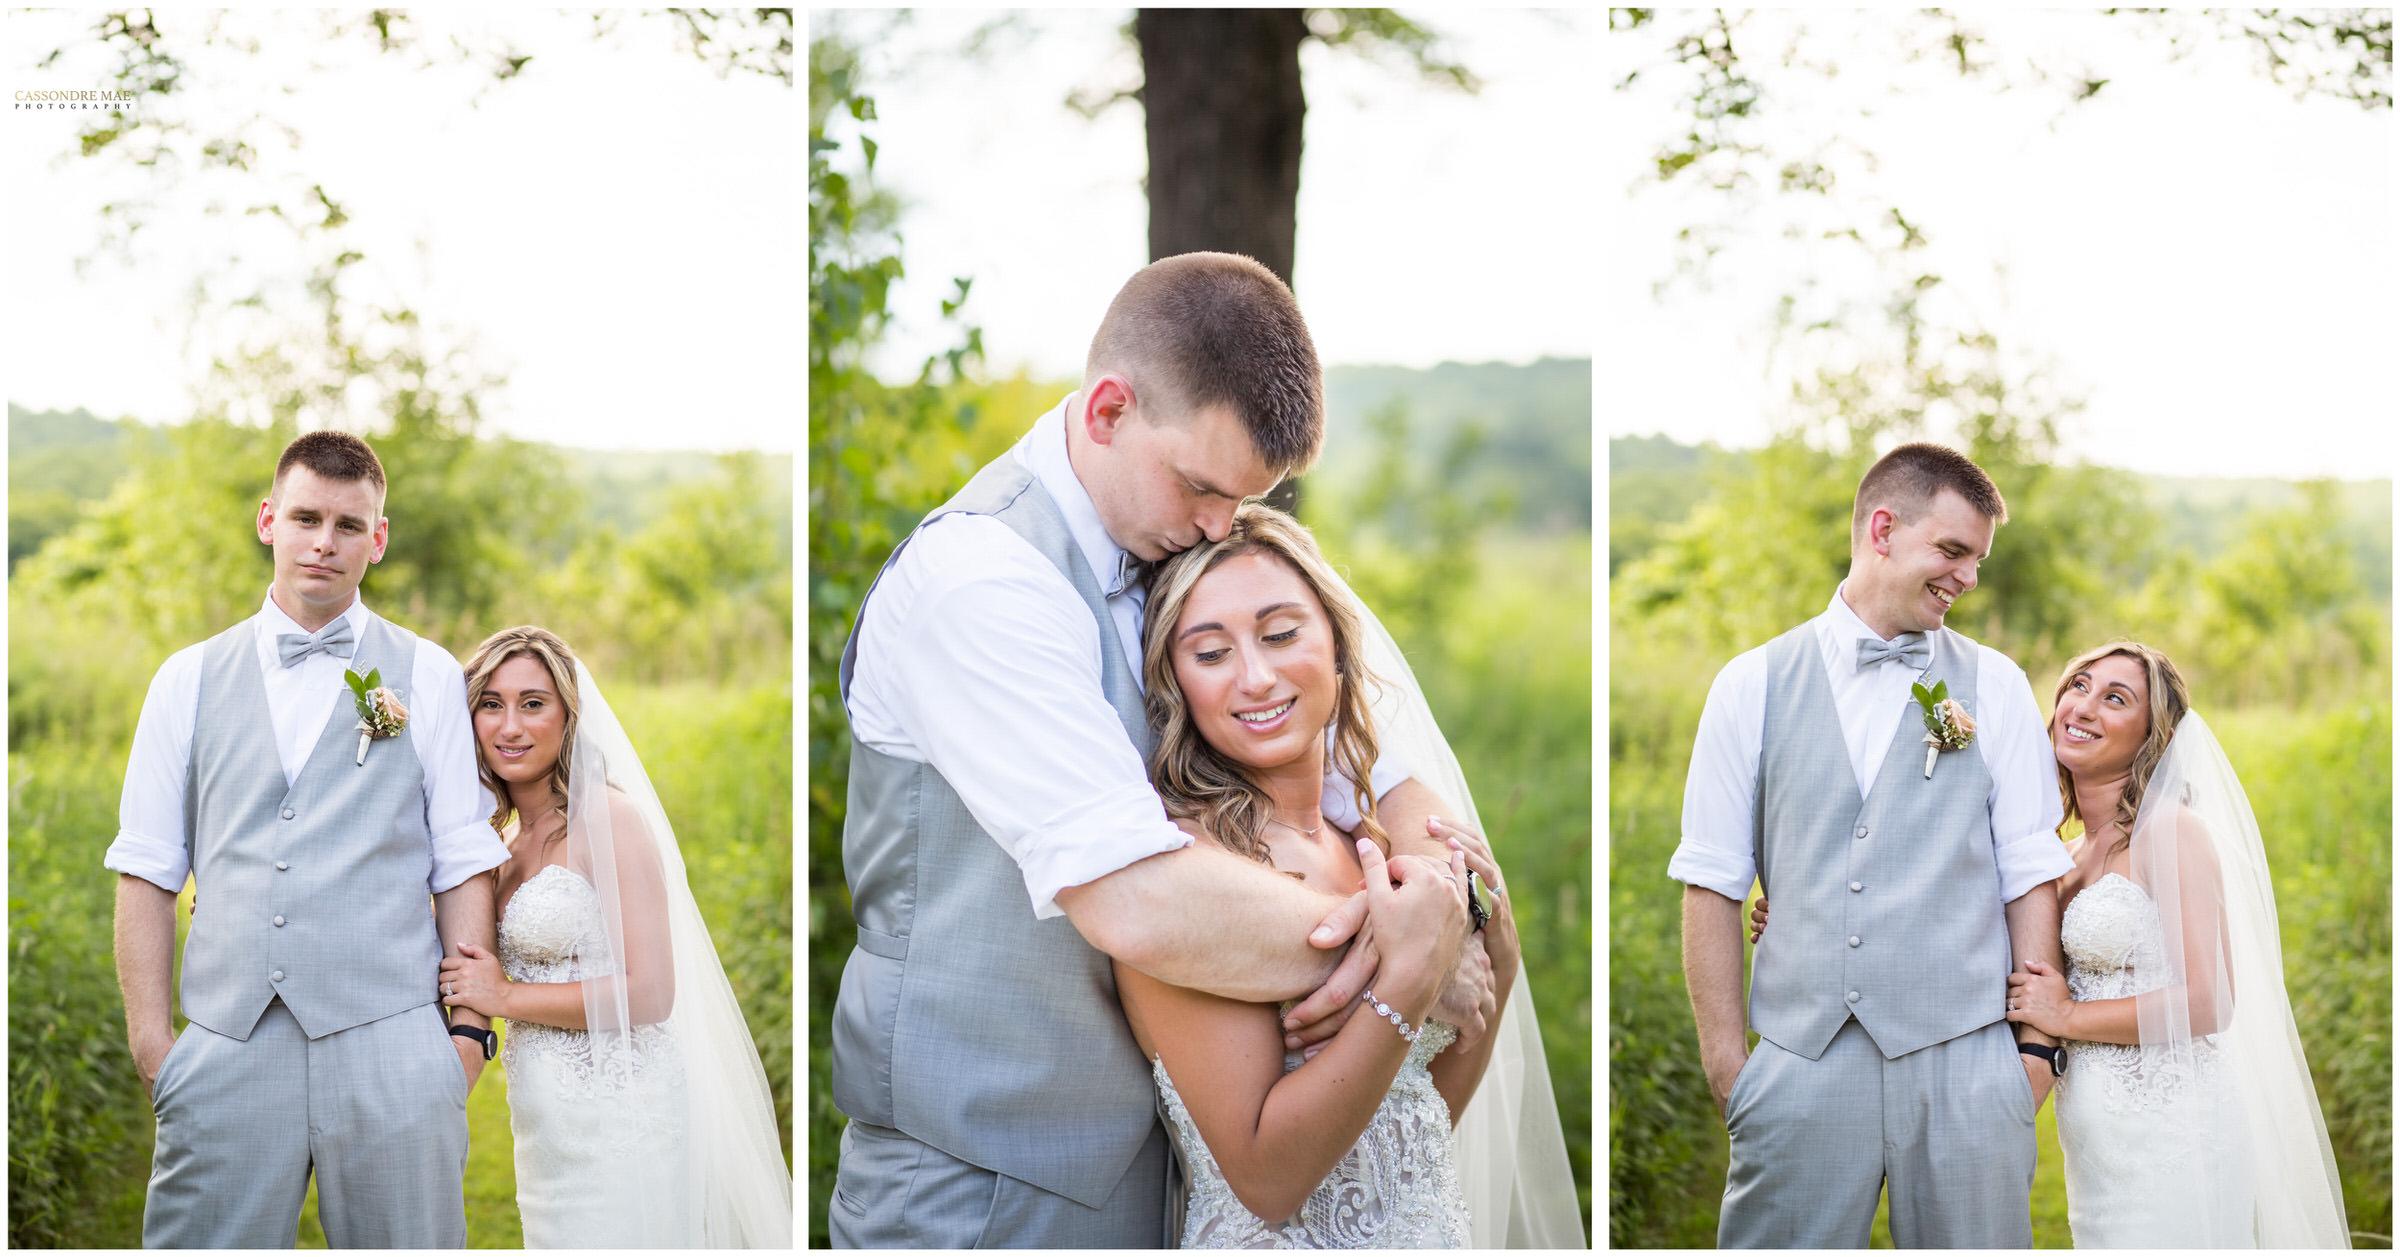 Cassondre Mae Photography Hudson Valley Wedding 24.jpg